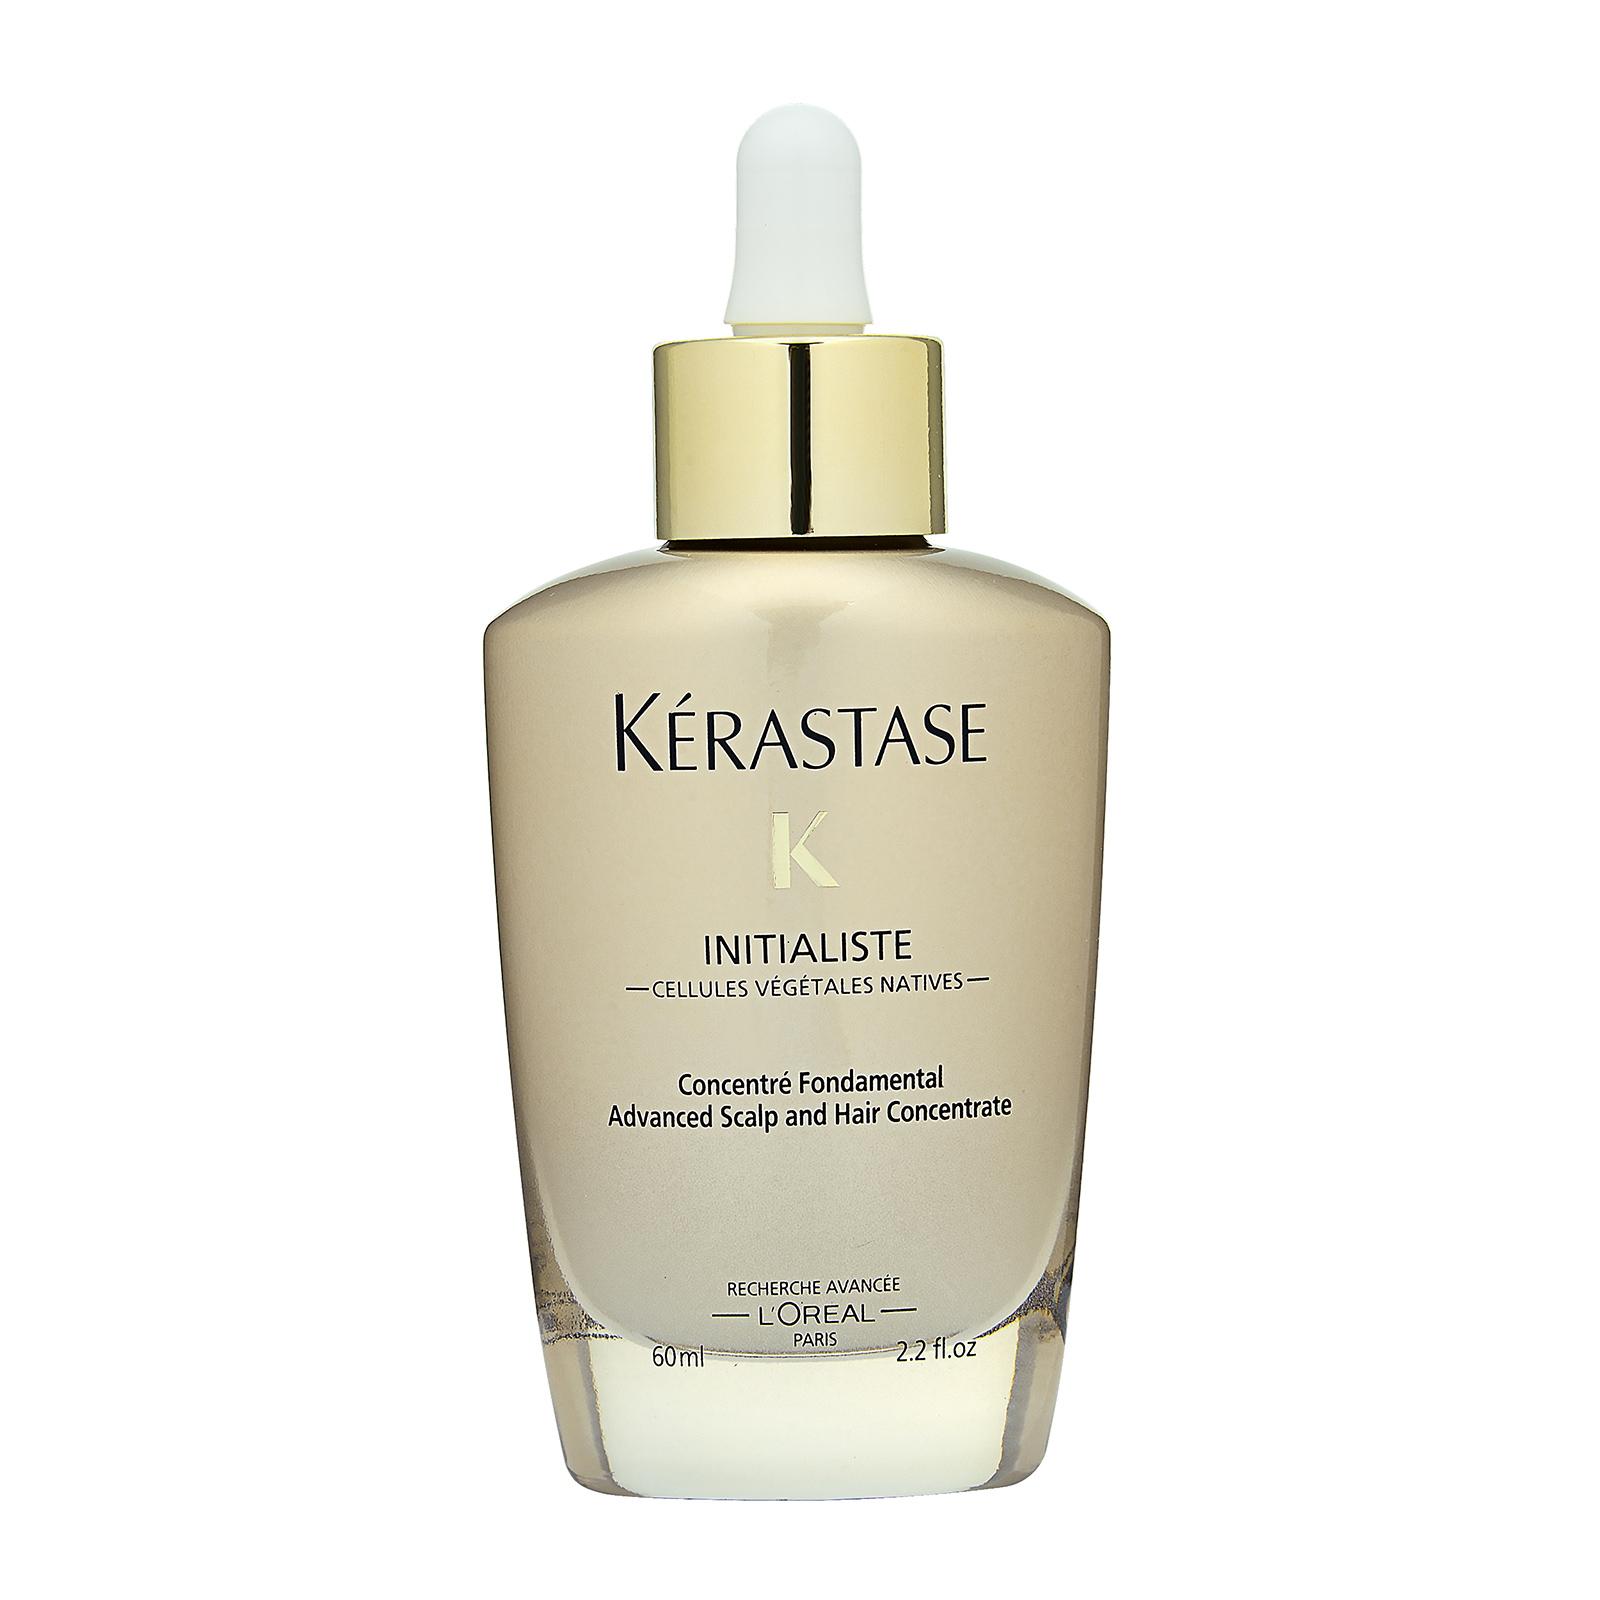 Kérastase Paris Initialiste Advanced Scalp and Hair Concentrate (Substance,  Resistance, Shine) 2.2oz, 60ml